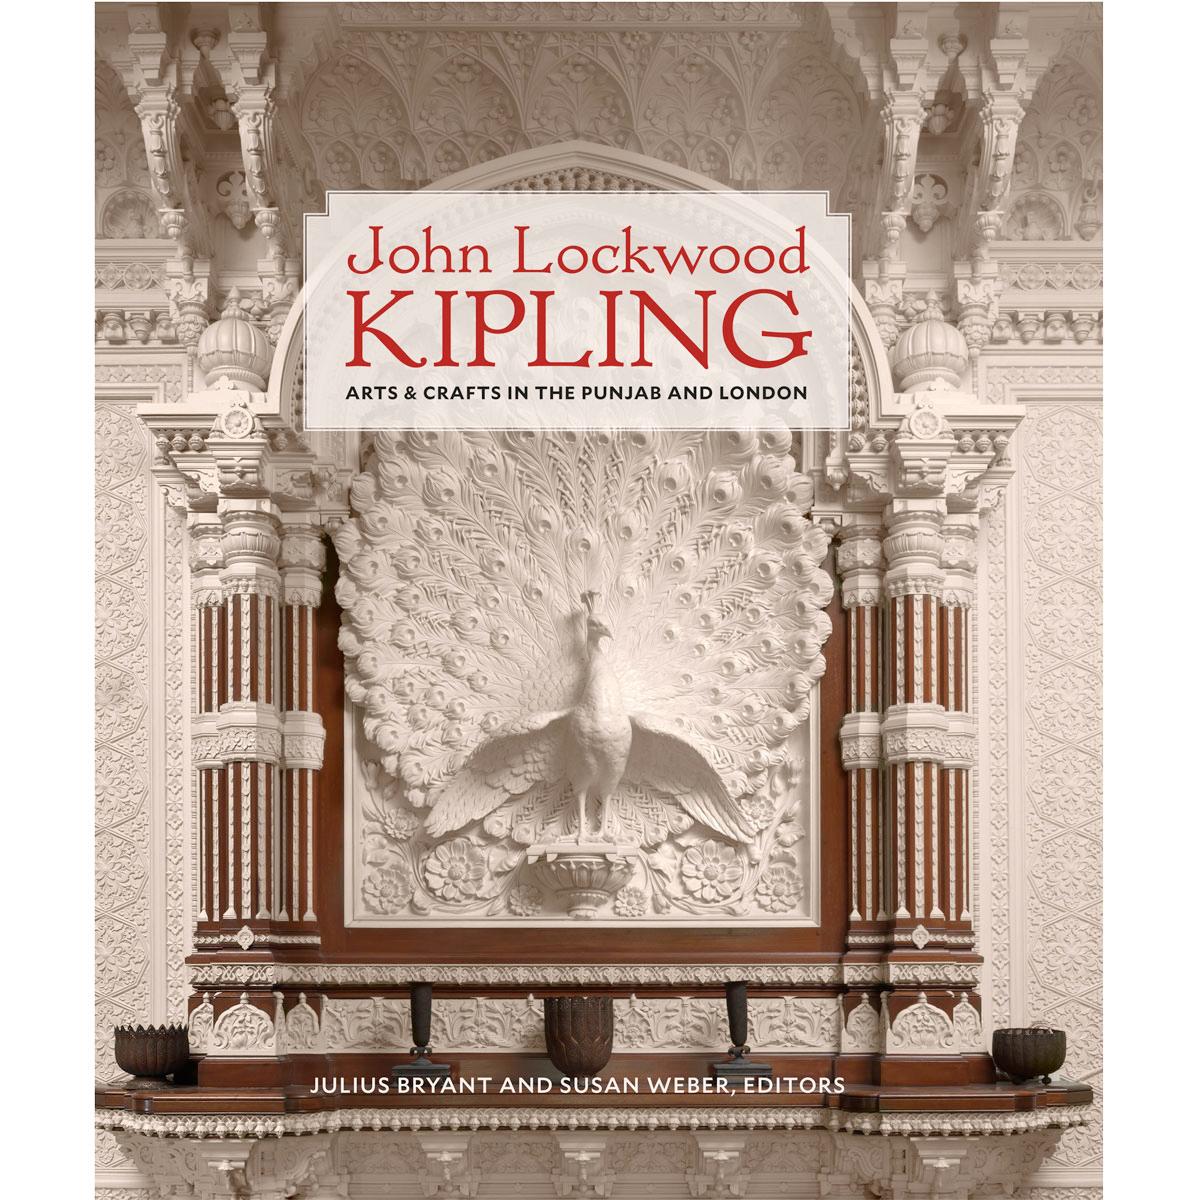 John Lockwood Kipling: Arts and Crafts in the Punjab and London (Hardcover)